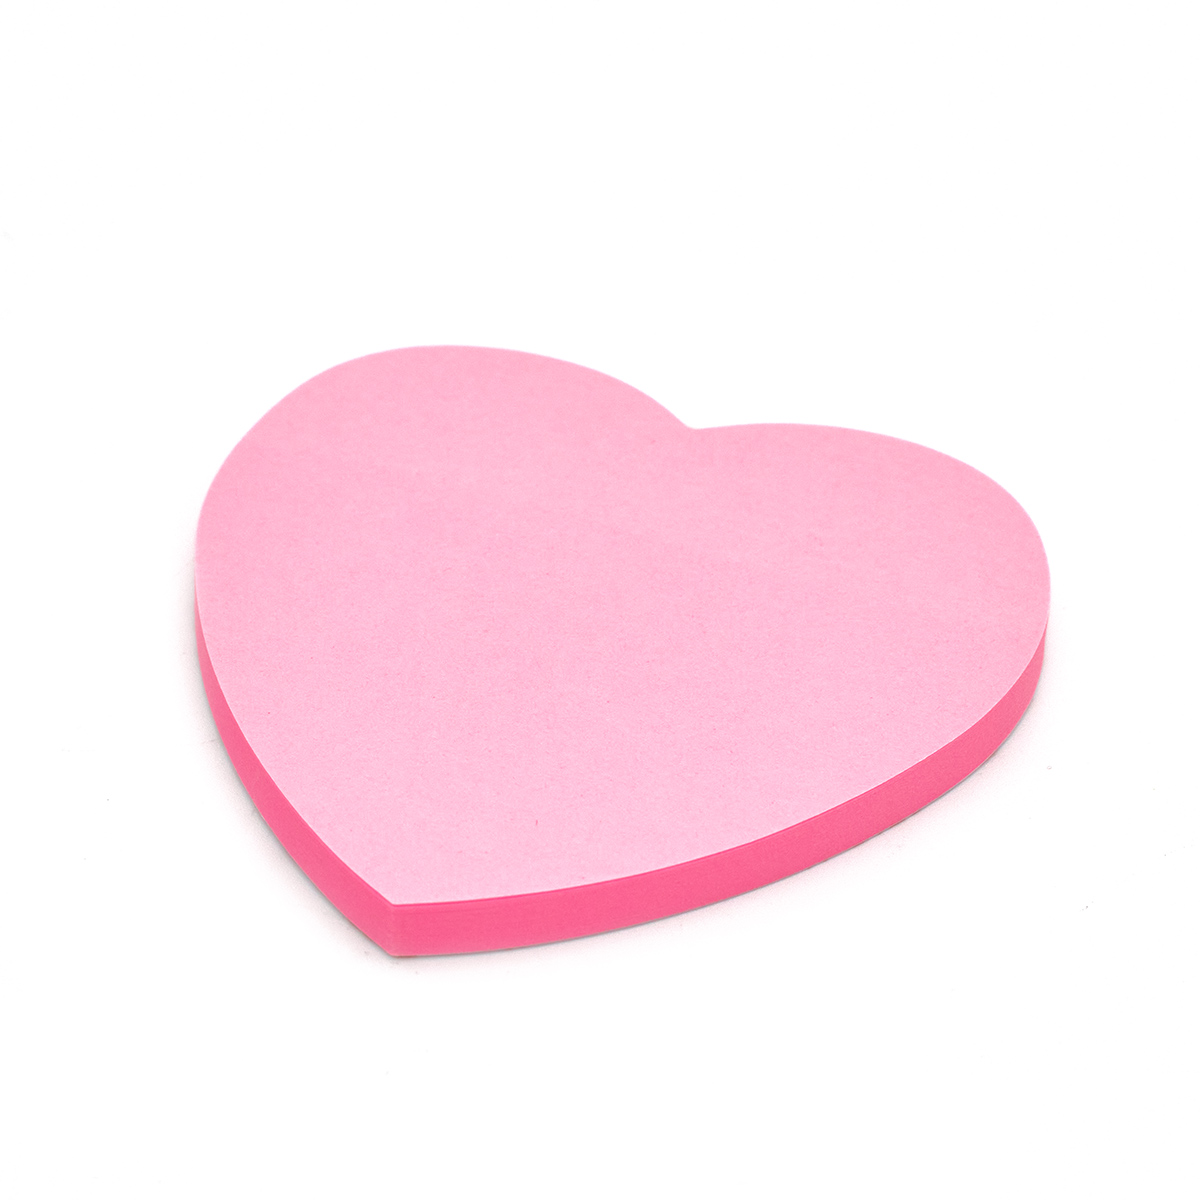 LAMARK0140 PK Бум/зам. фигурная Сердце неон розовая